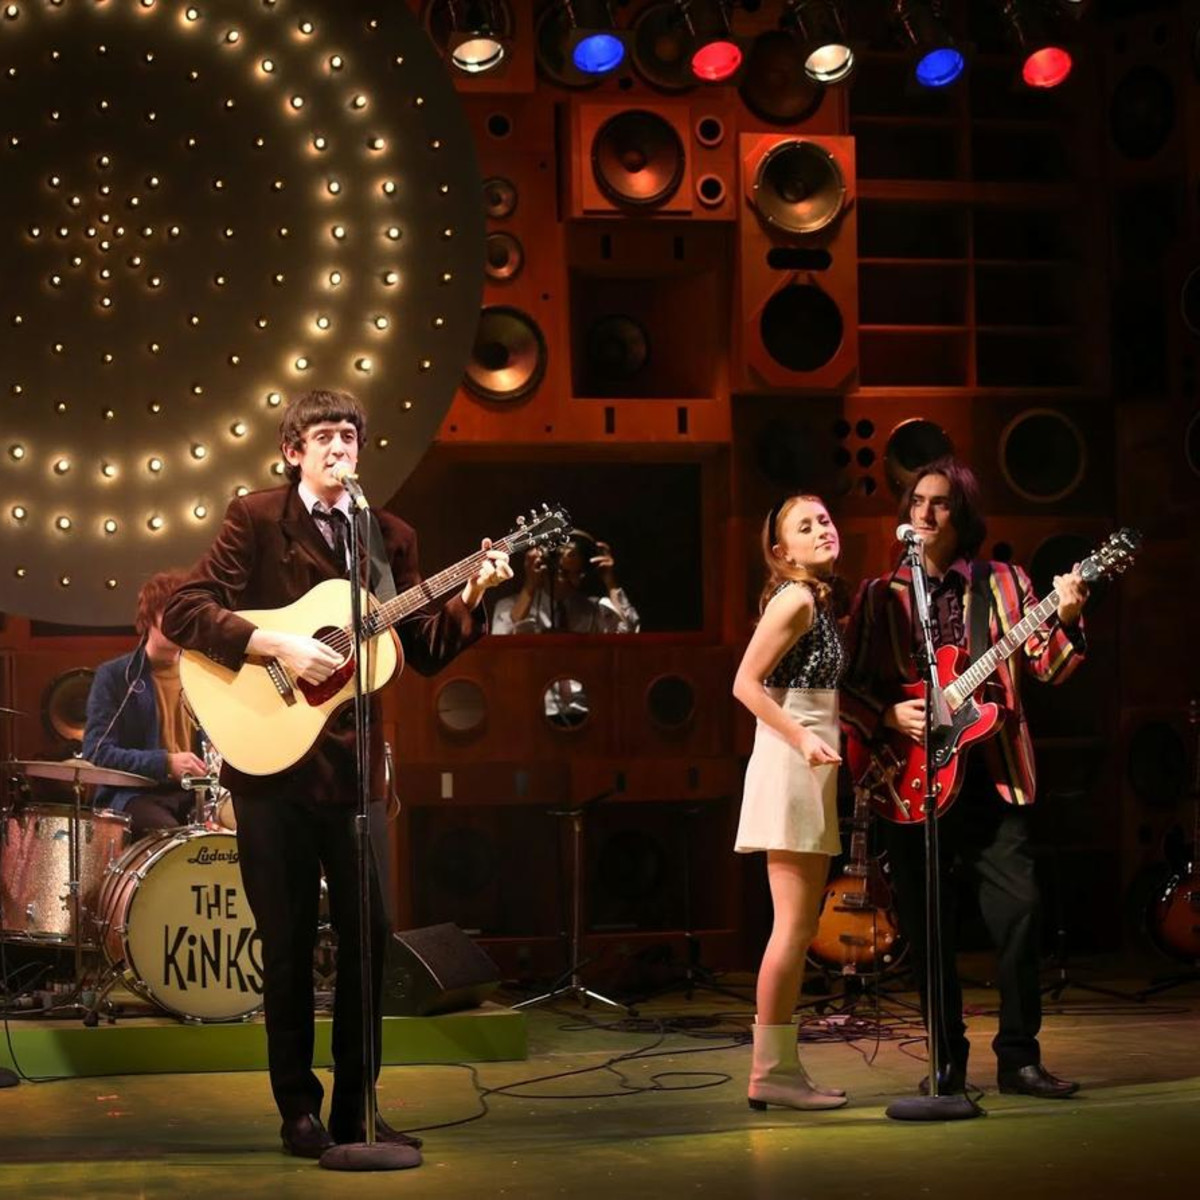 Sunny Afternoon Kinks musical London